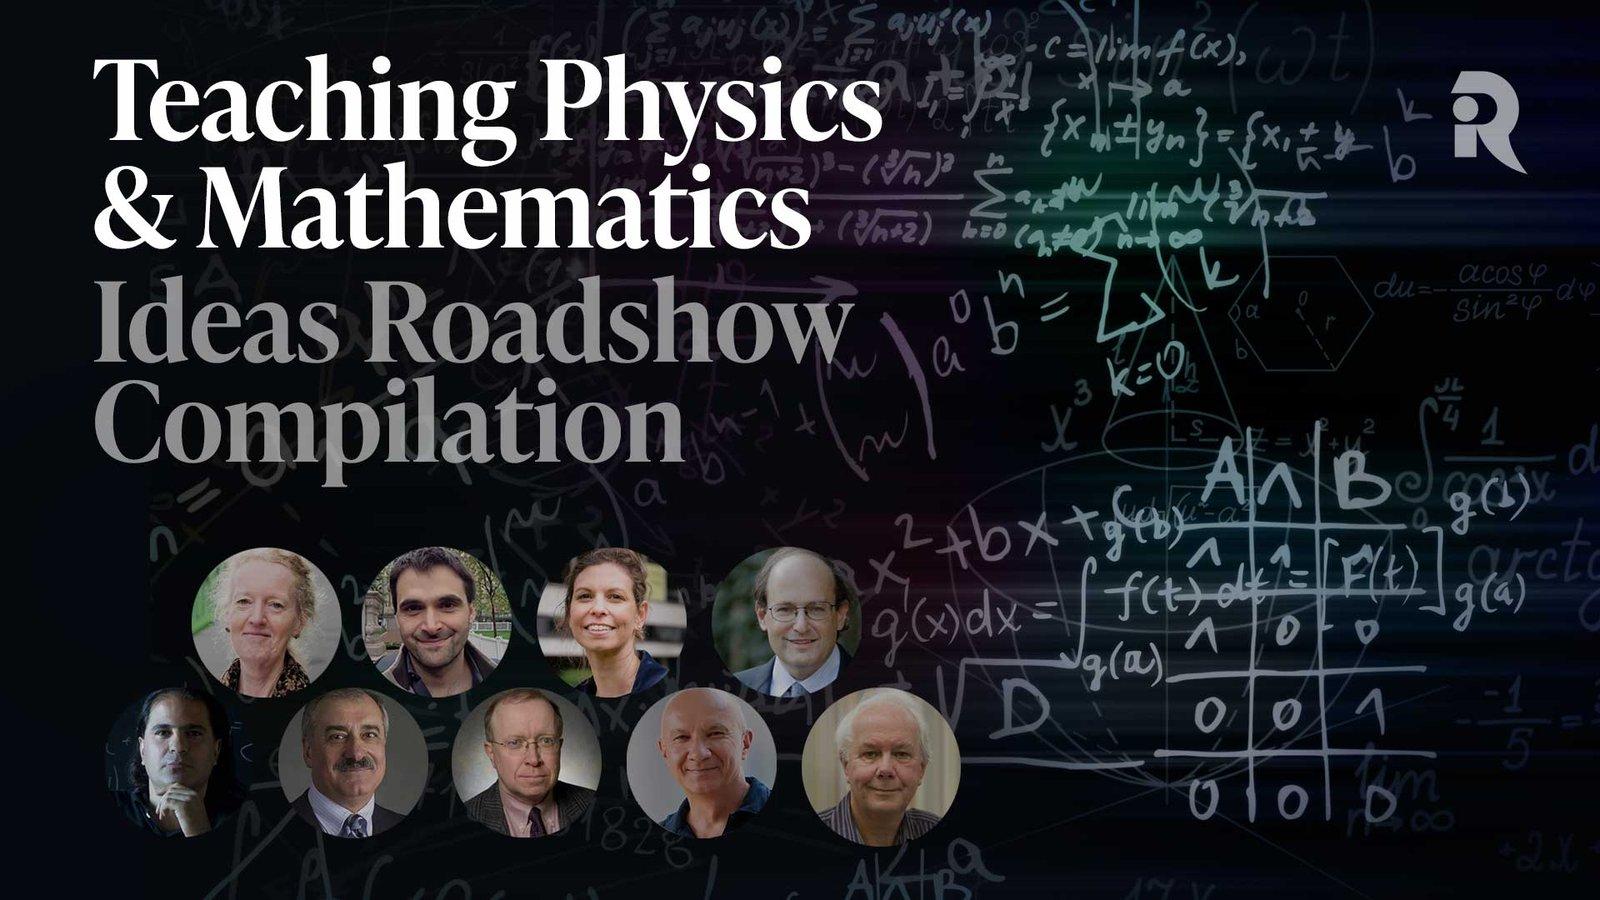 Teaching Physics and Mathematics